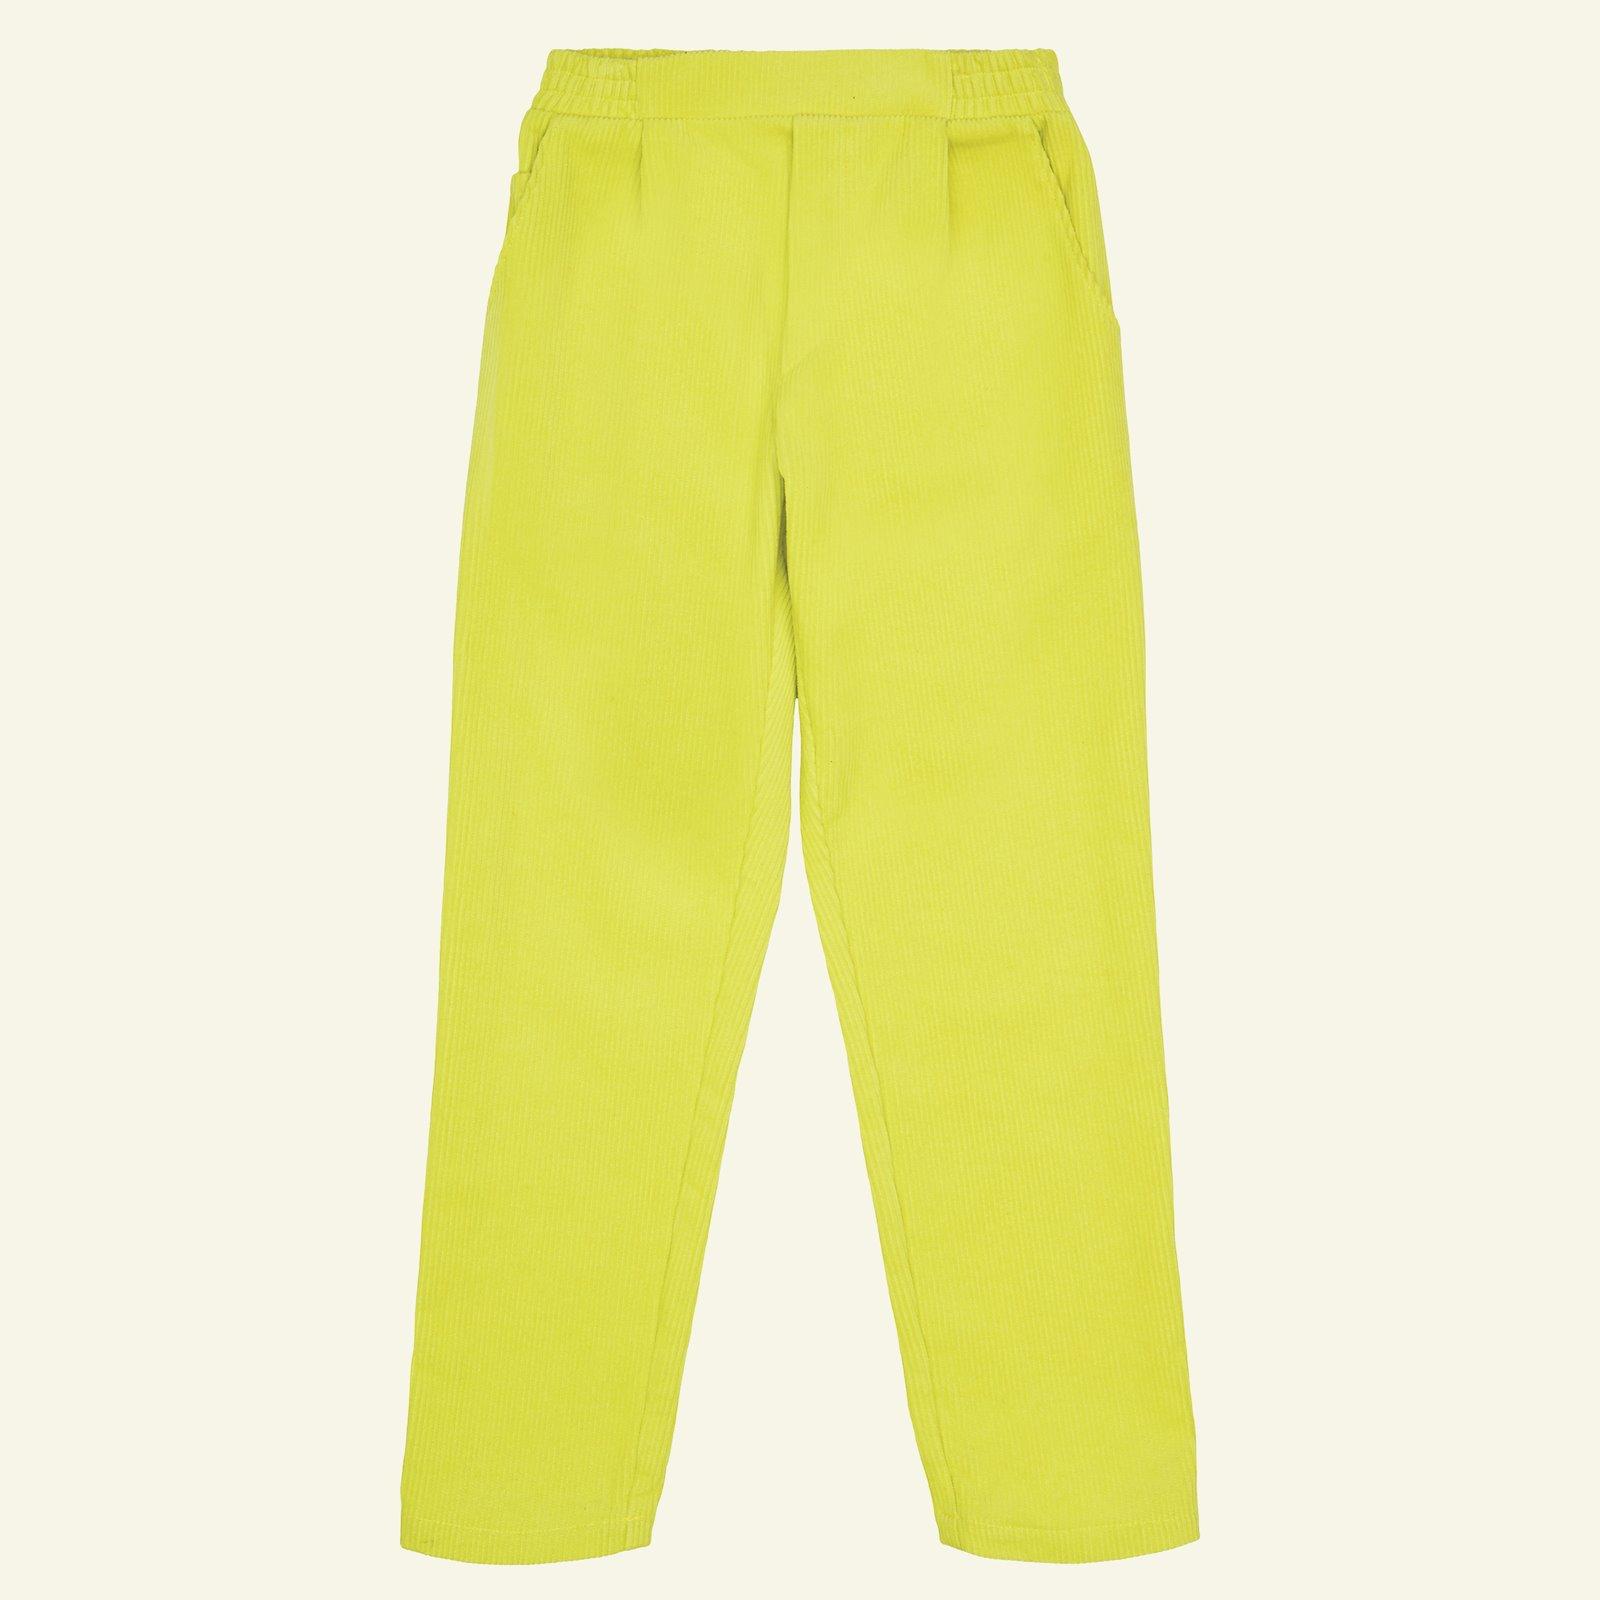 Chino pants, 98/3y p60033_430822_sskit